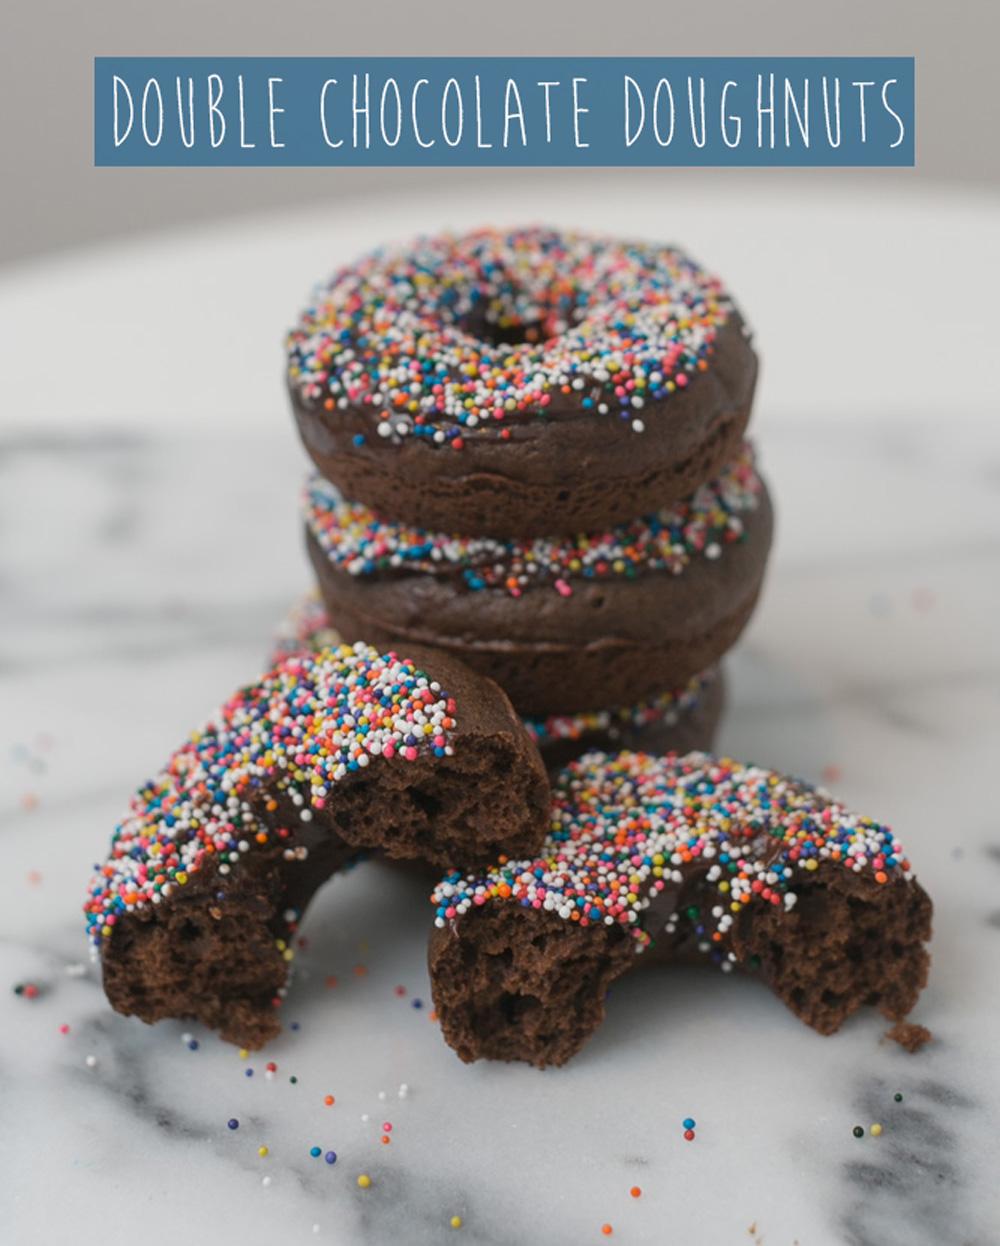 Baked Double Chocolate Doughnuts | Becca Bakes (www.becca-bakes.com)